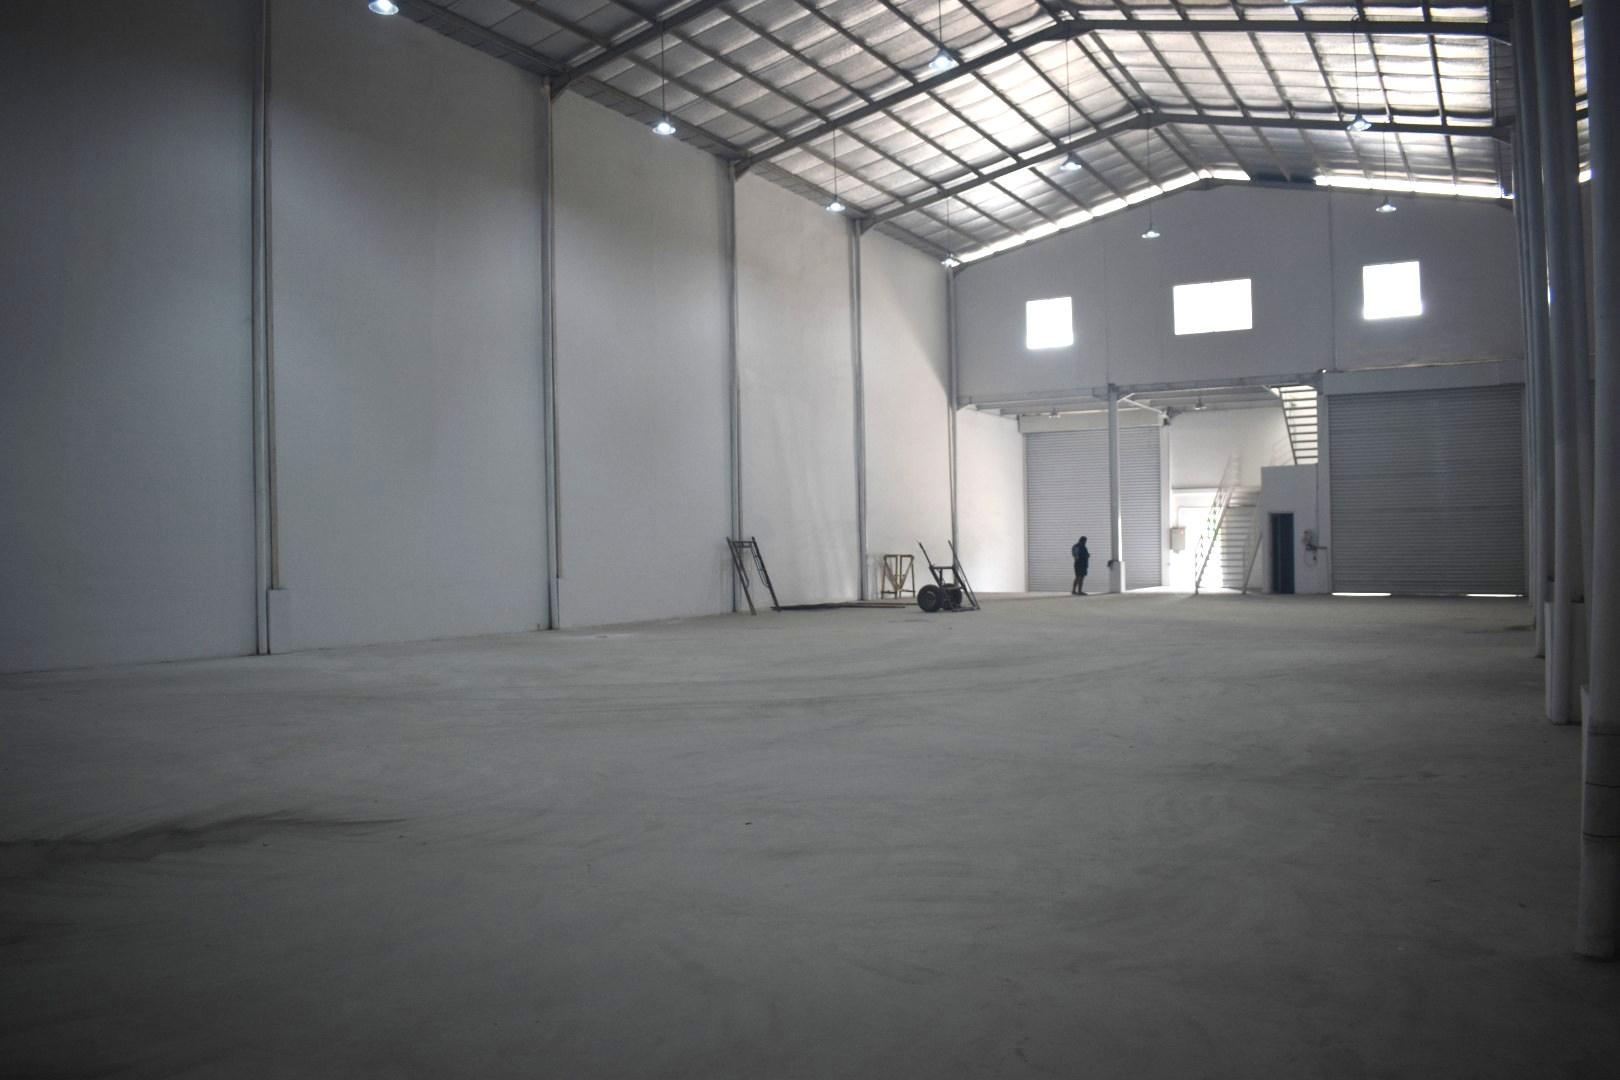 Sewa Gudang Baru Loading Dock Kawasan Industri Delta Silicon Cikarang - 6